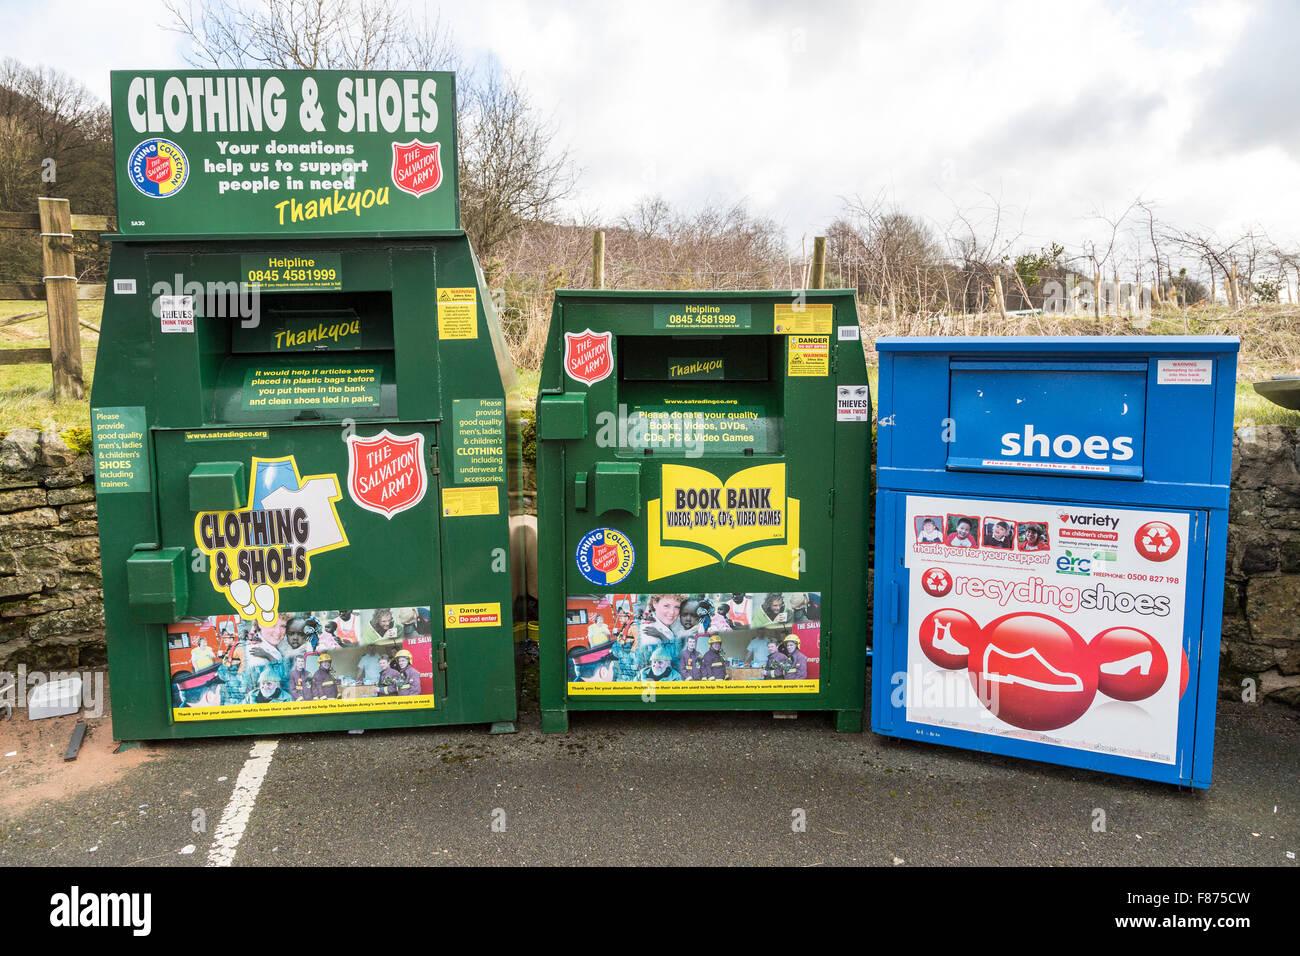 Recycling-Zentrum im Parkhaus, Eyam, UK Stockbild